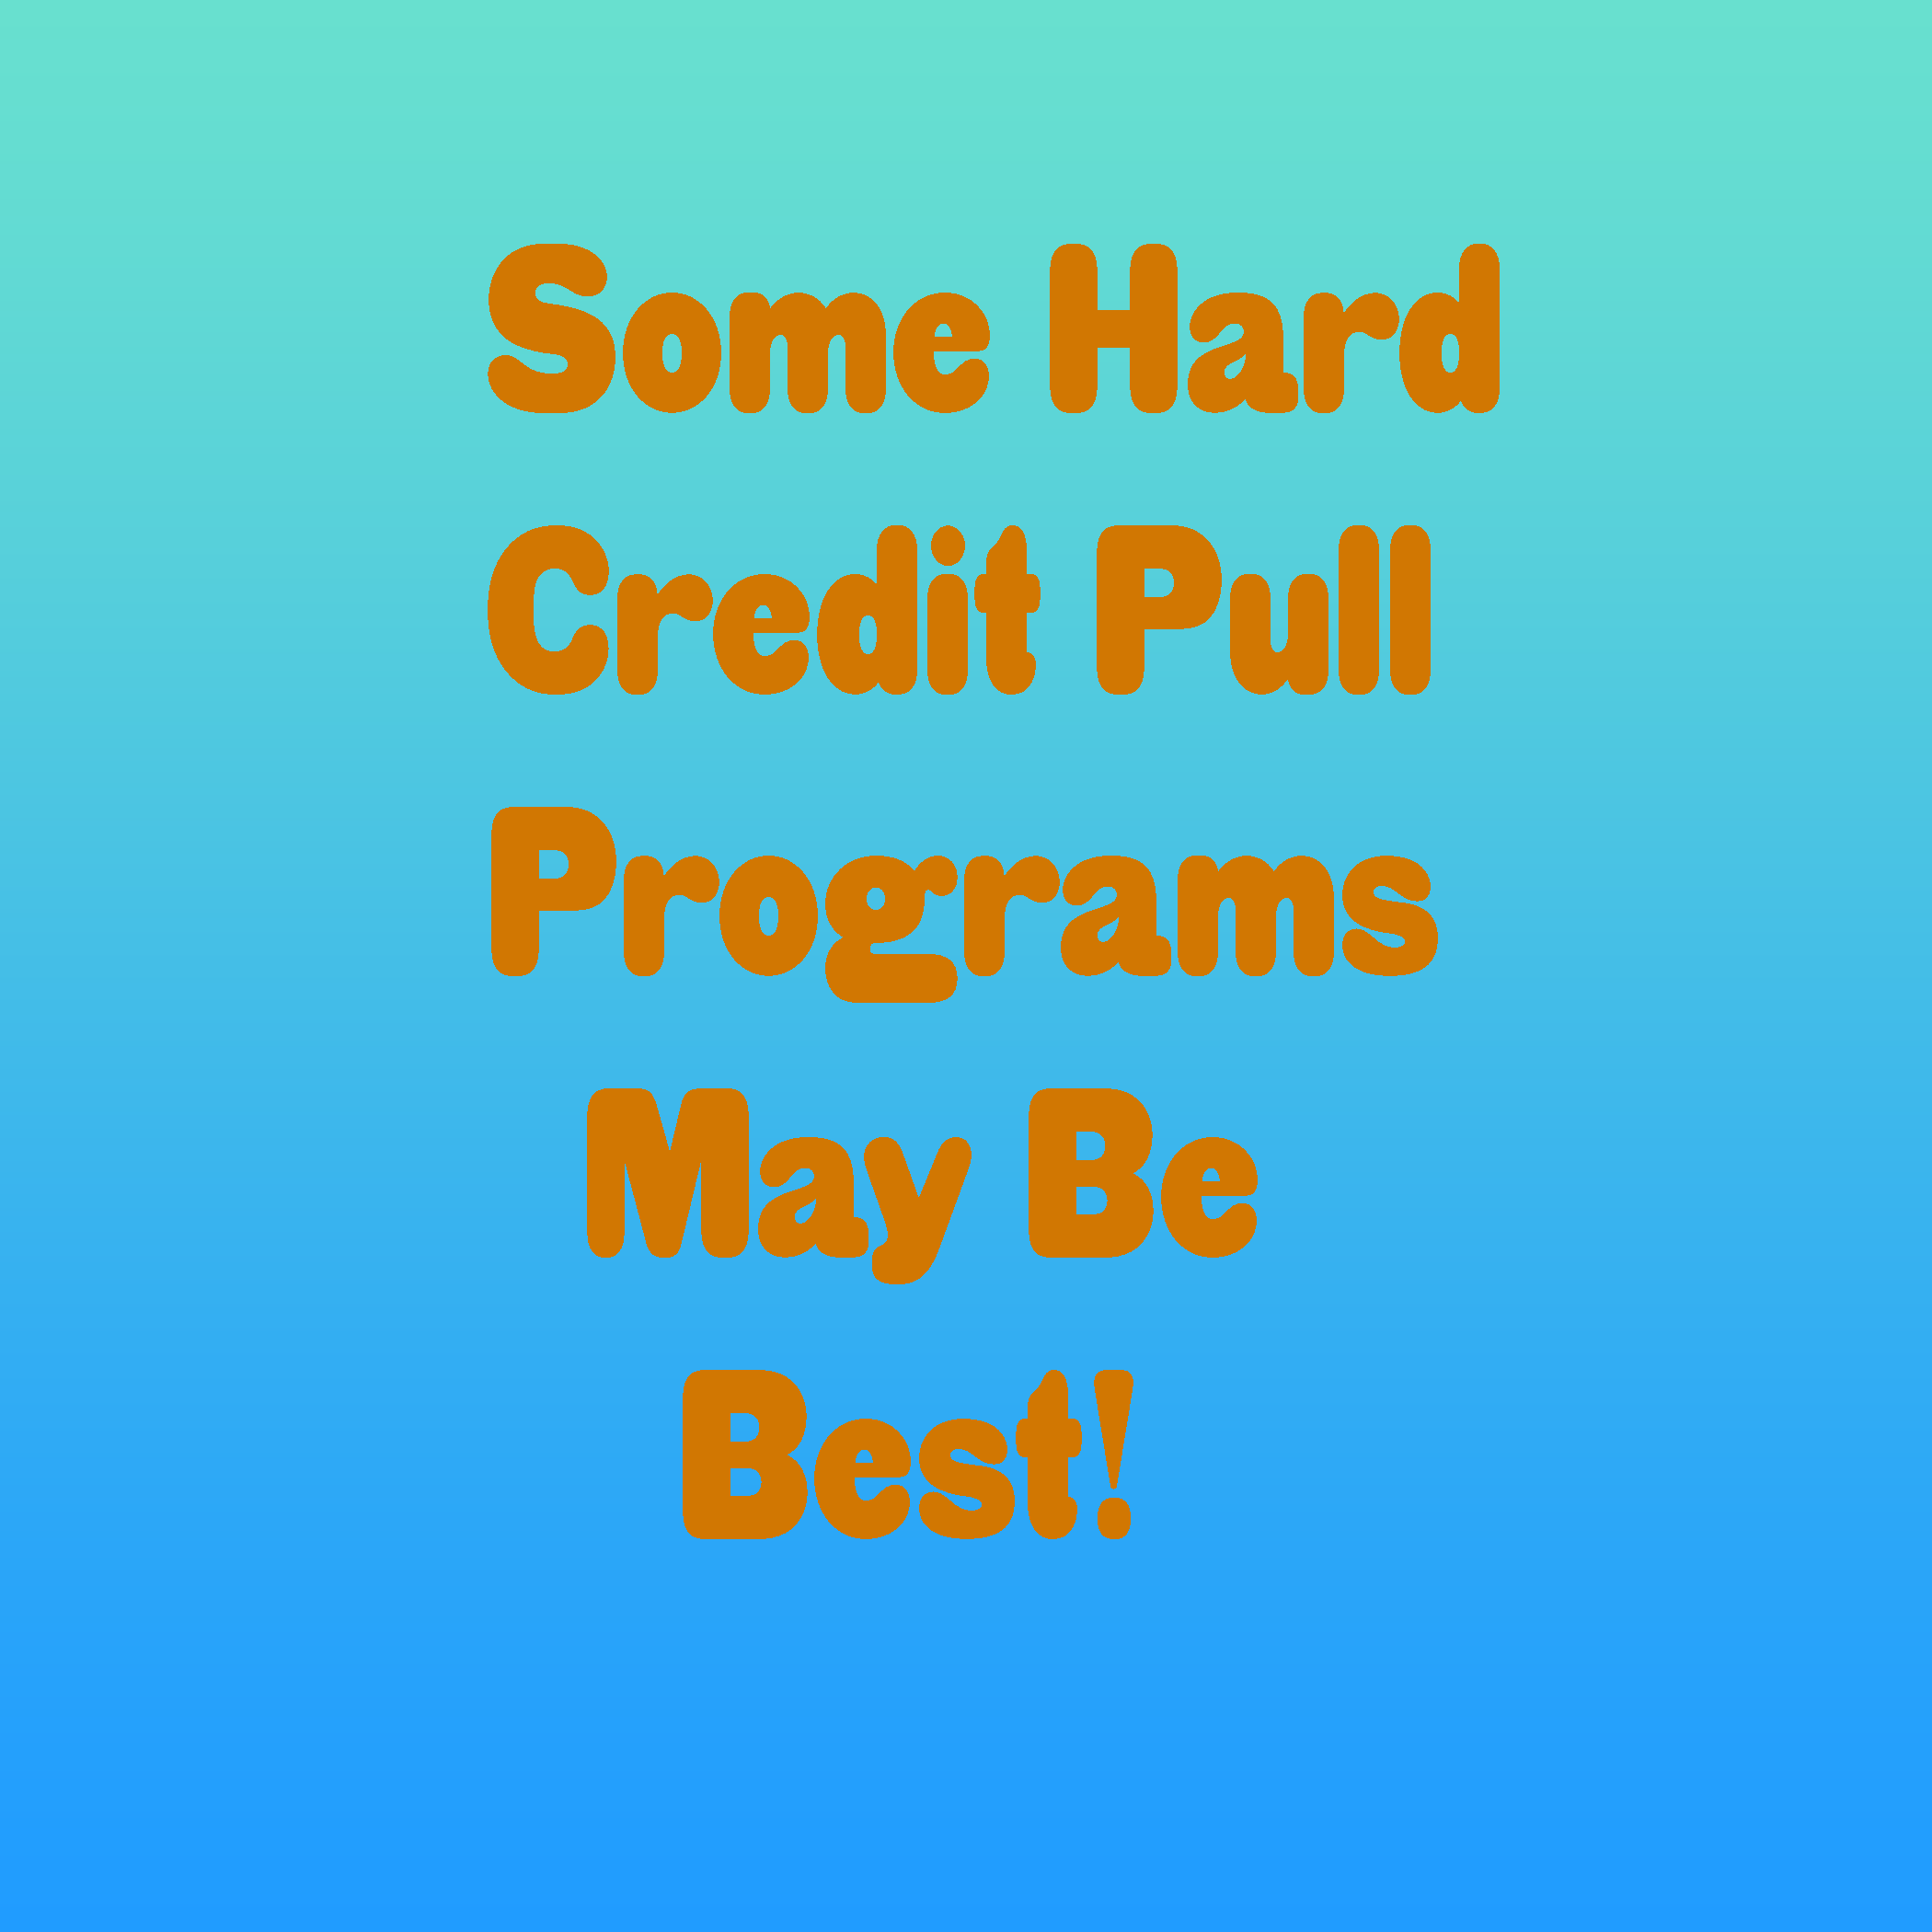 Hard Credit Pull Best Program